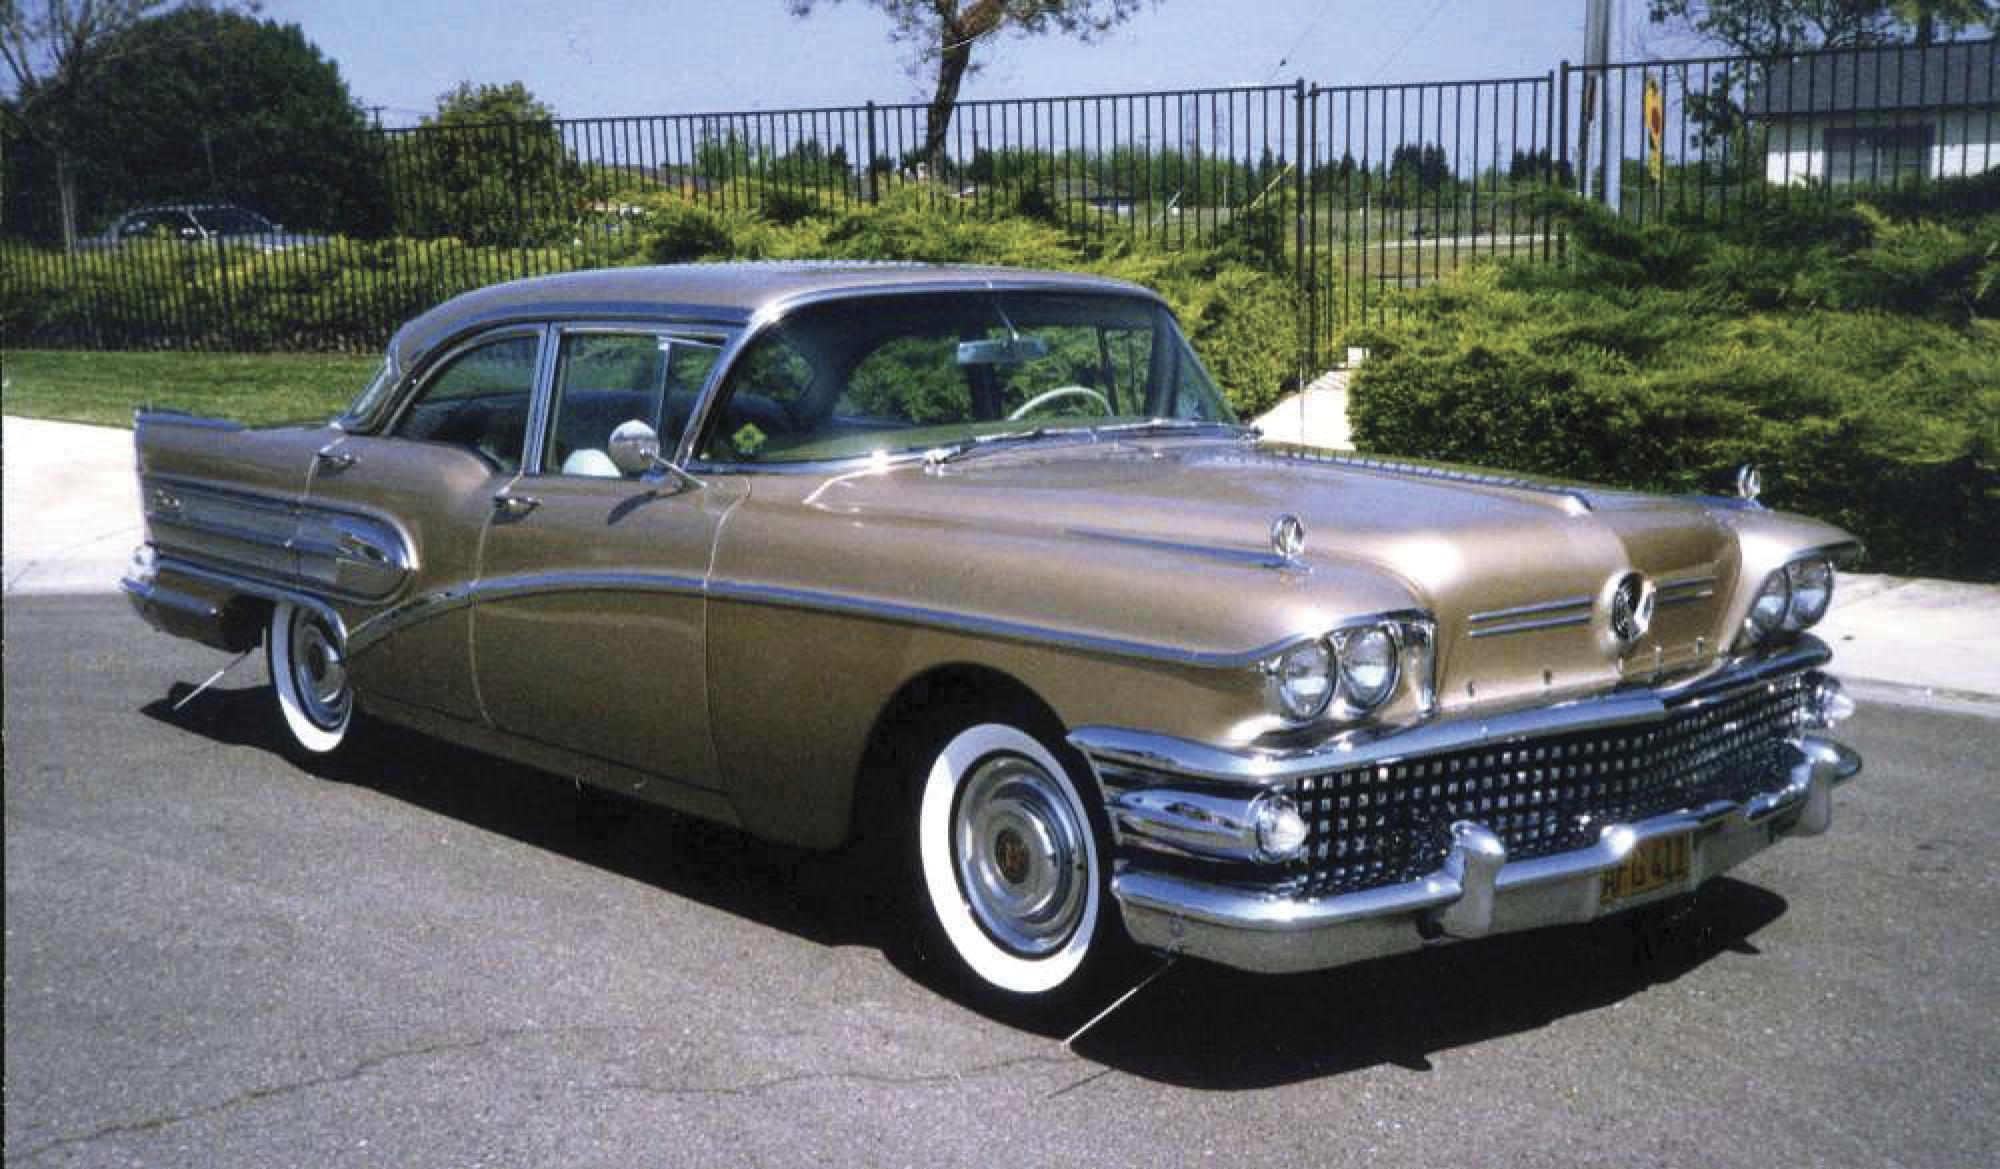 The classics: 1958 Century a big, boxy, gaudy Buick